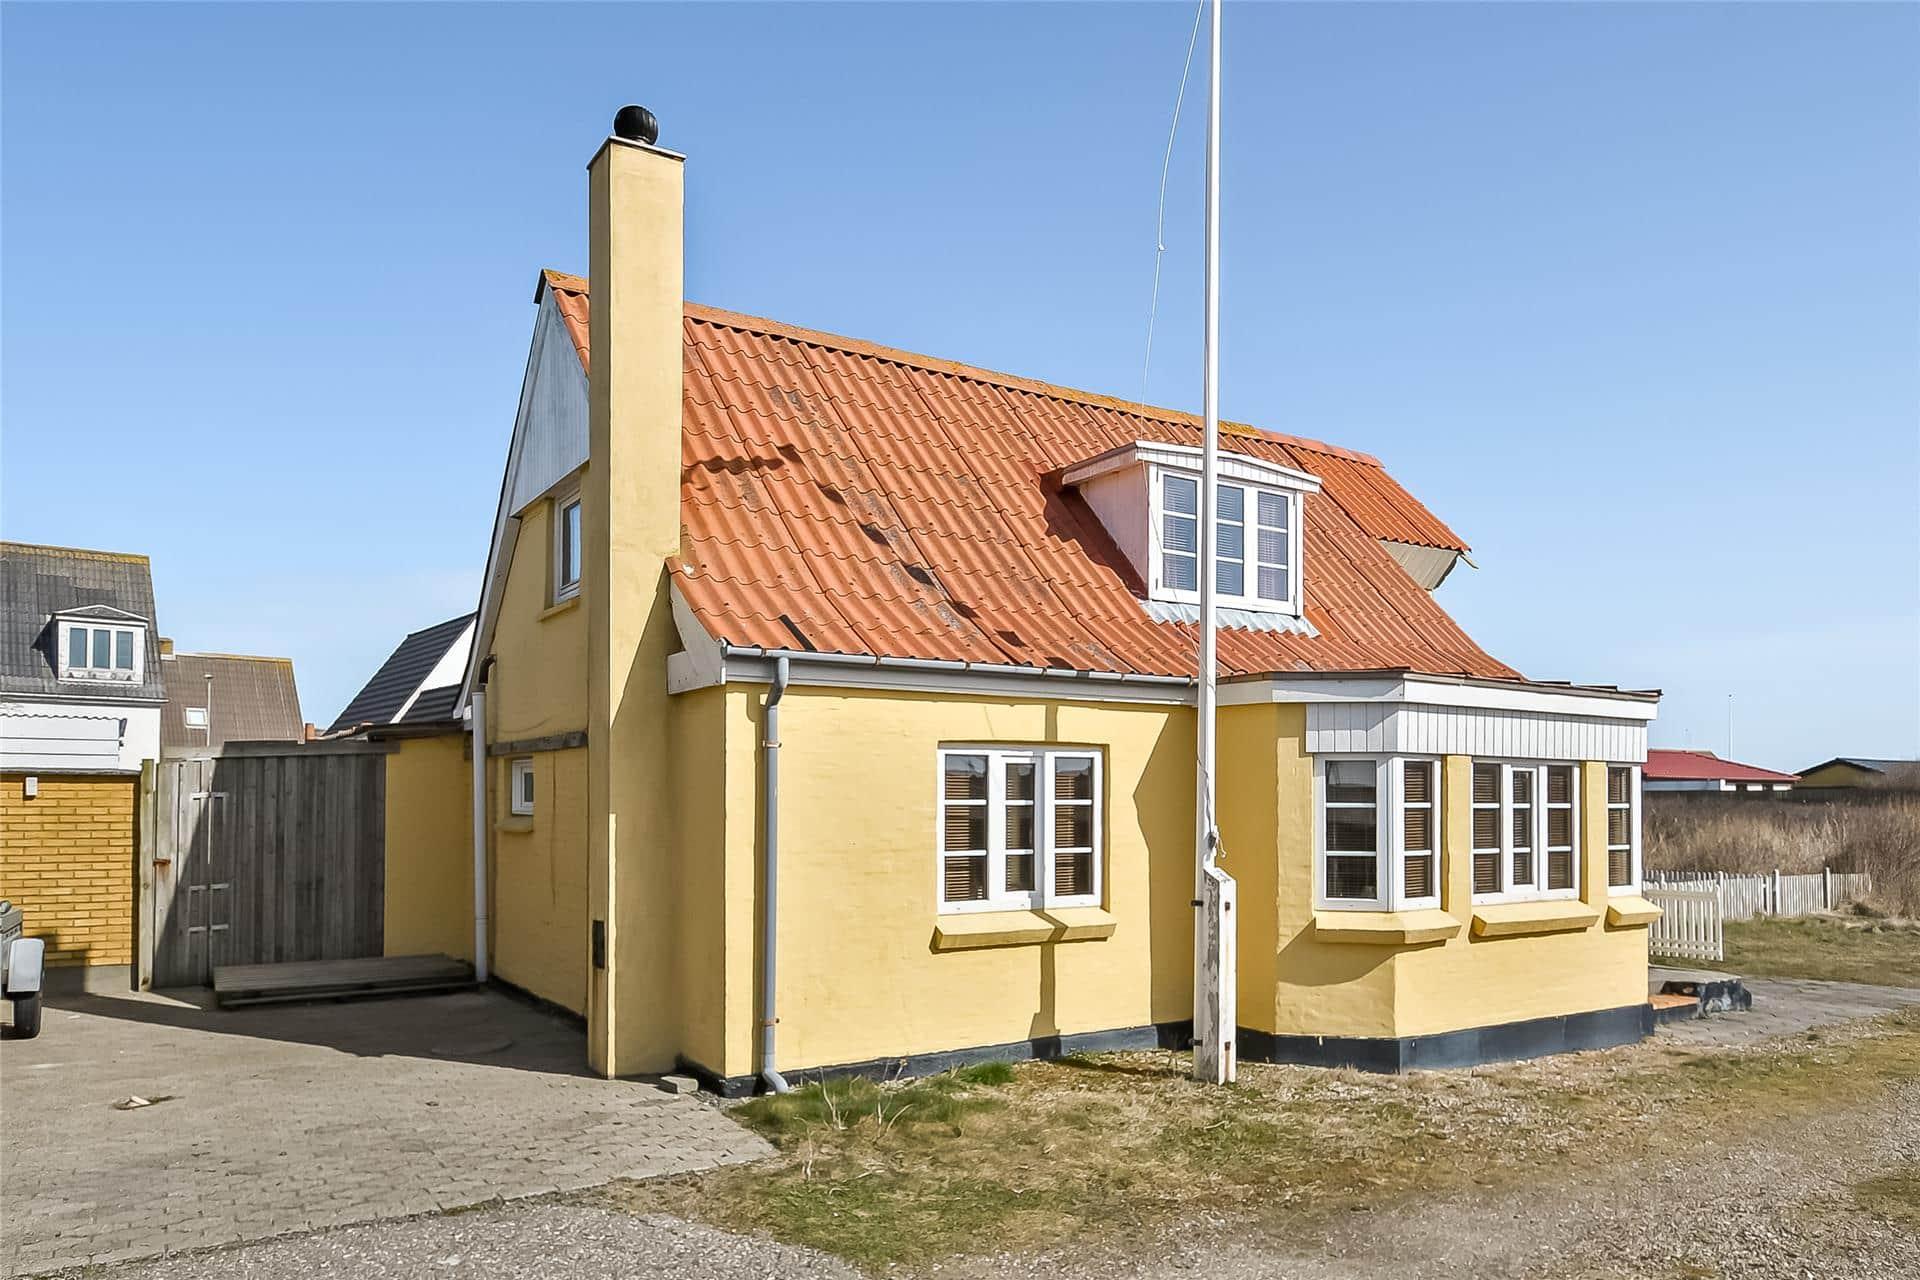 Billede 1-20 Sommerhus 707, Manøvej 9, DK - 7680 Thyborøn